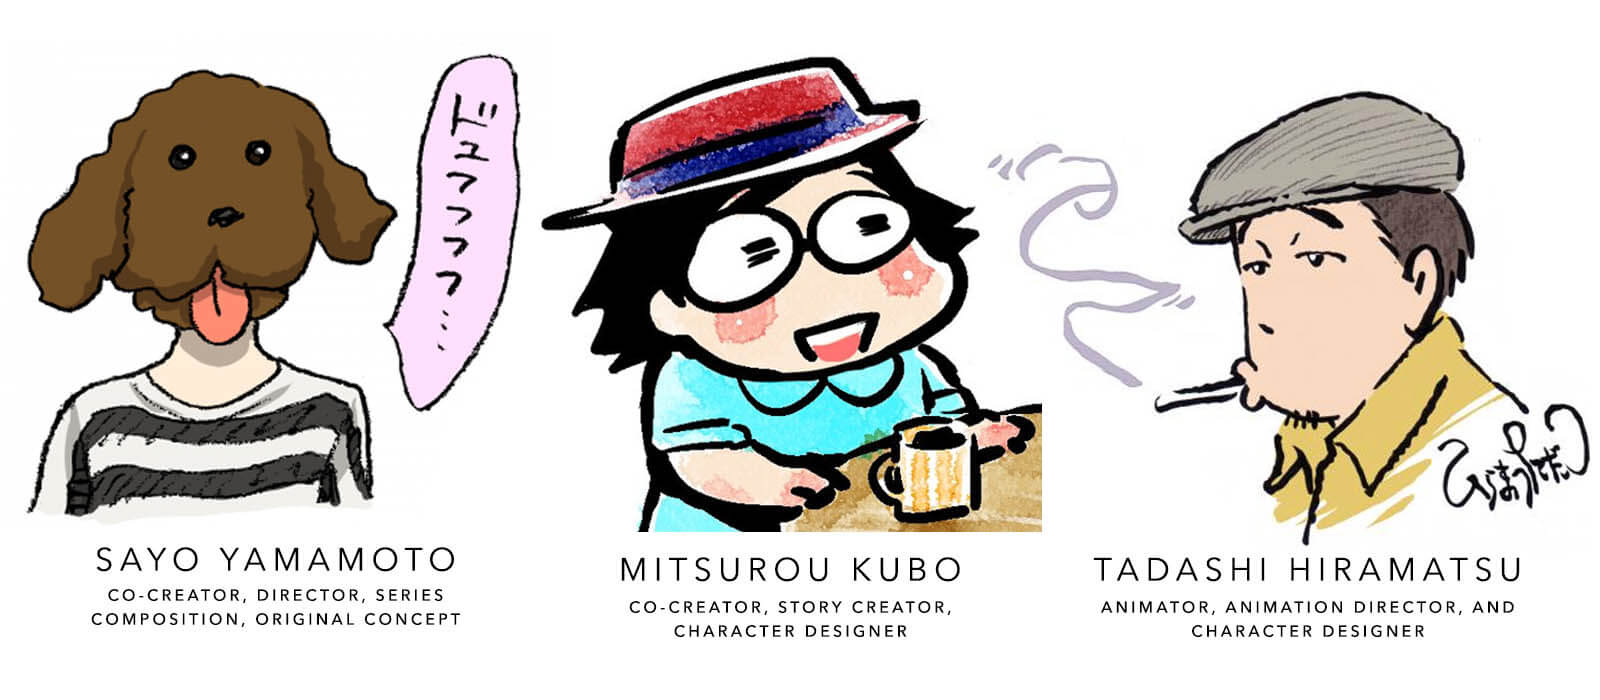 Yamamoto's, Kubo's, and Hiramatsu's avatars they use to associate with themselves